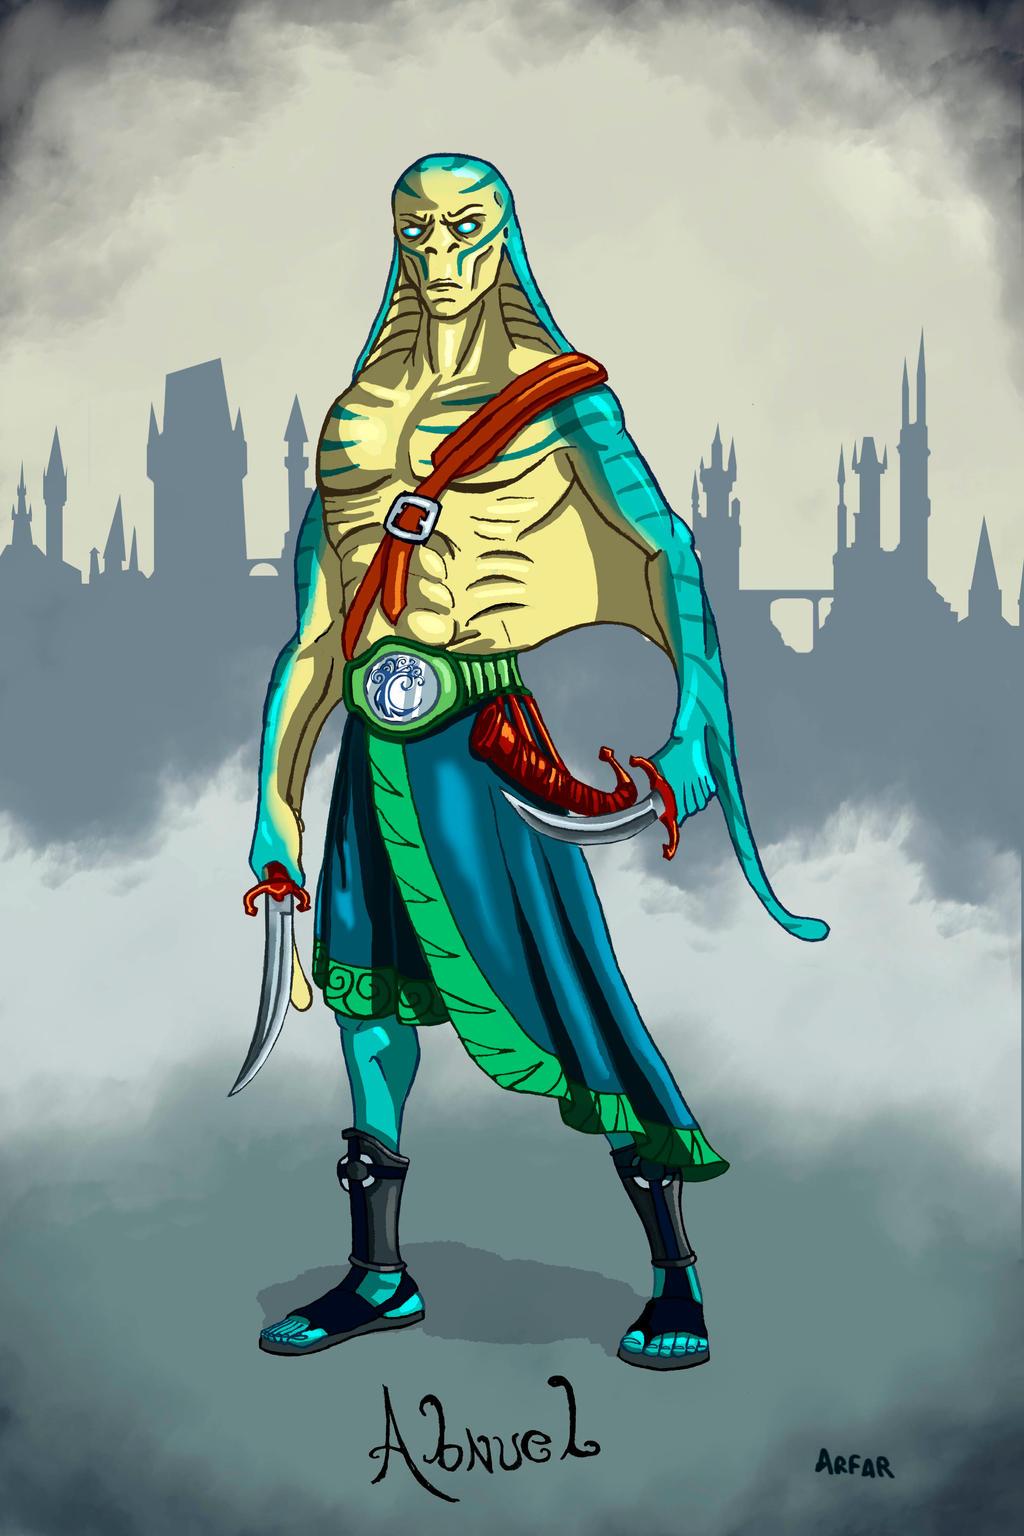 Abnuel Simic Hiblid Sorcerer By Arfar29 On Deviantart